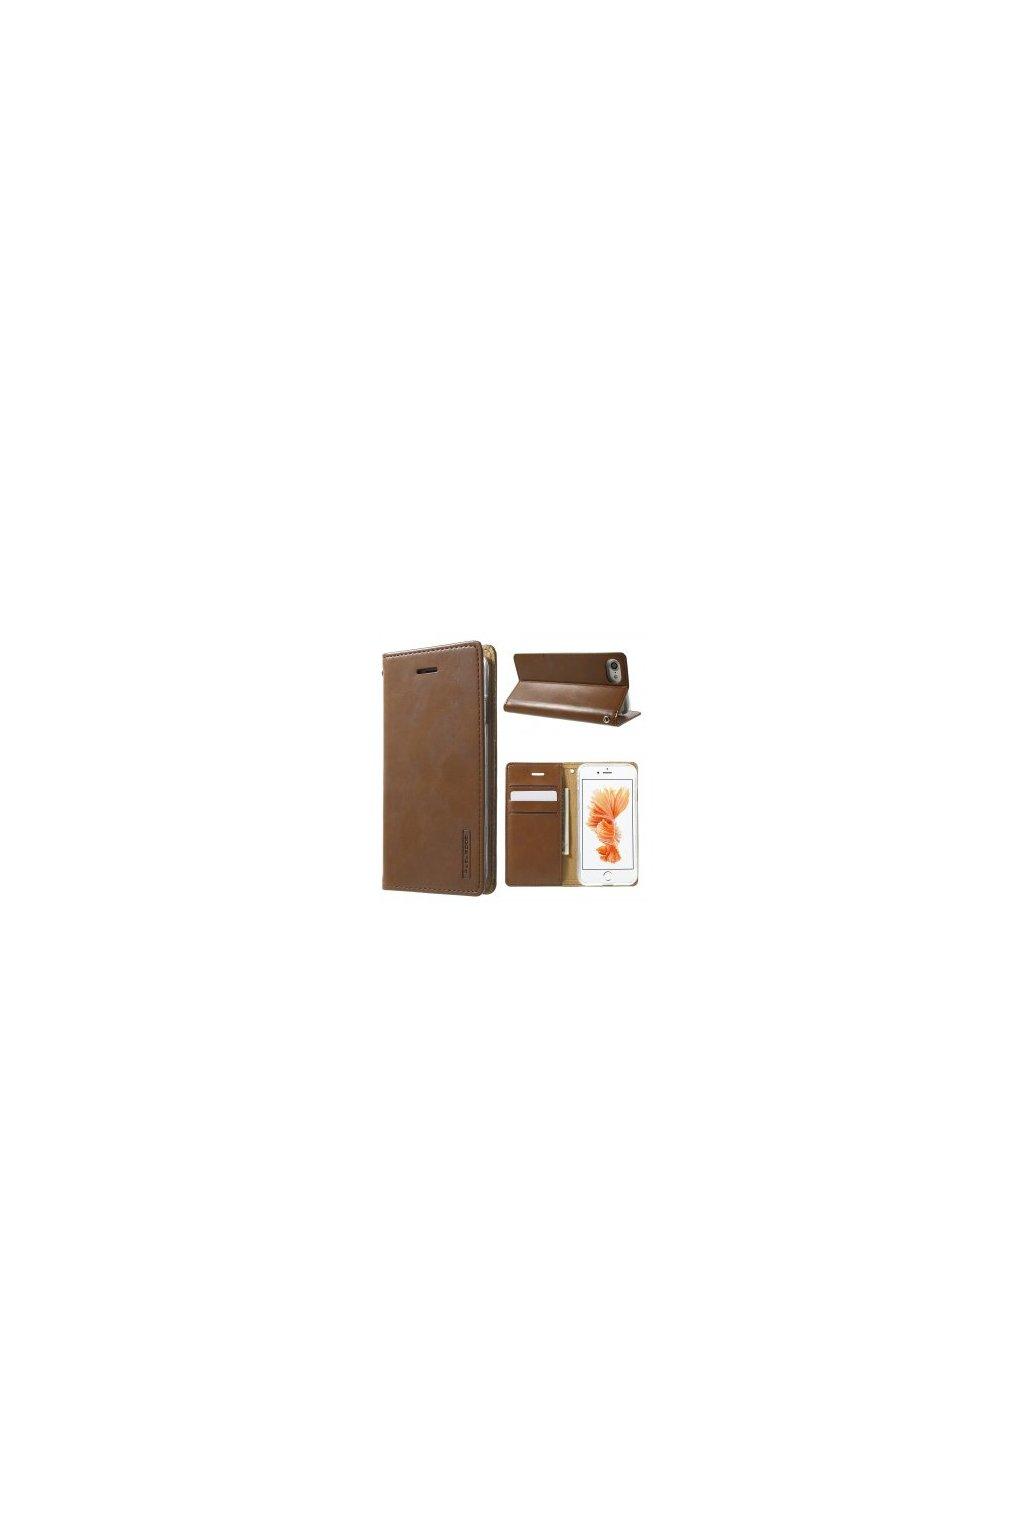 7313 pouzdro kryt pro iphone 7 8 mercury bluemoon flip brown